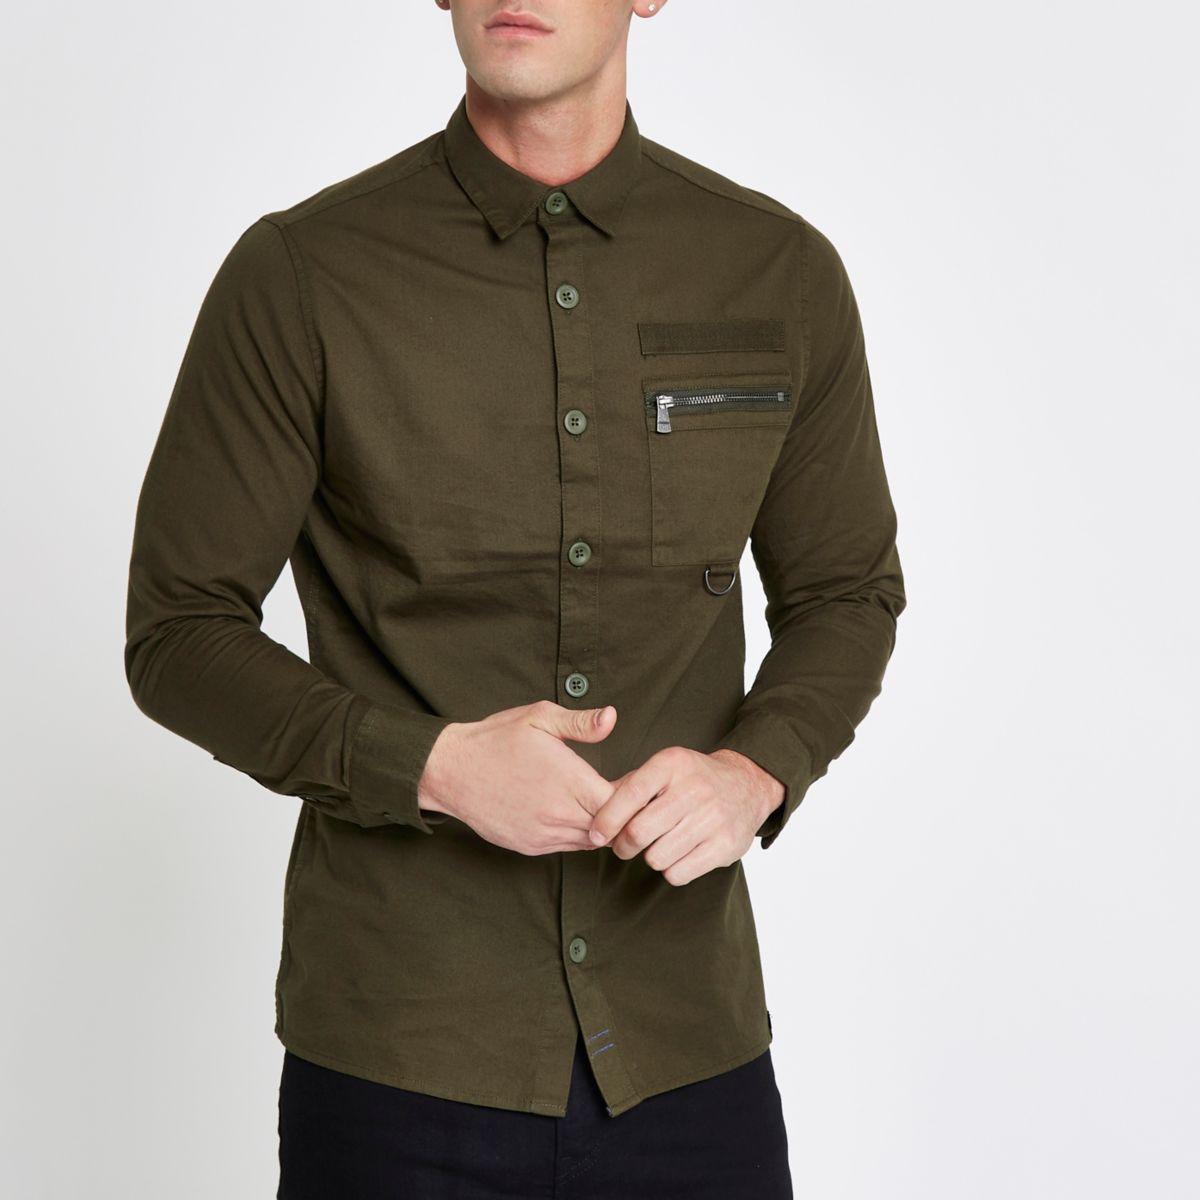 Only & Sons khaki green pocket shirt